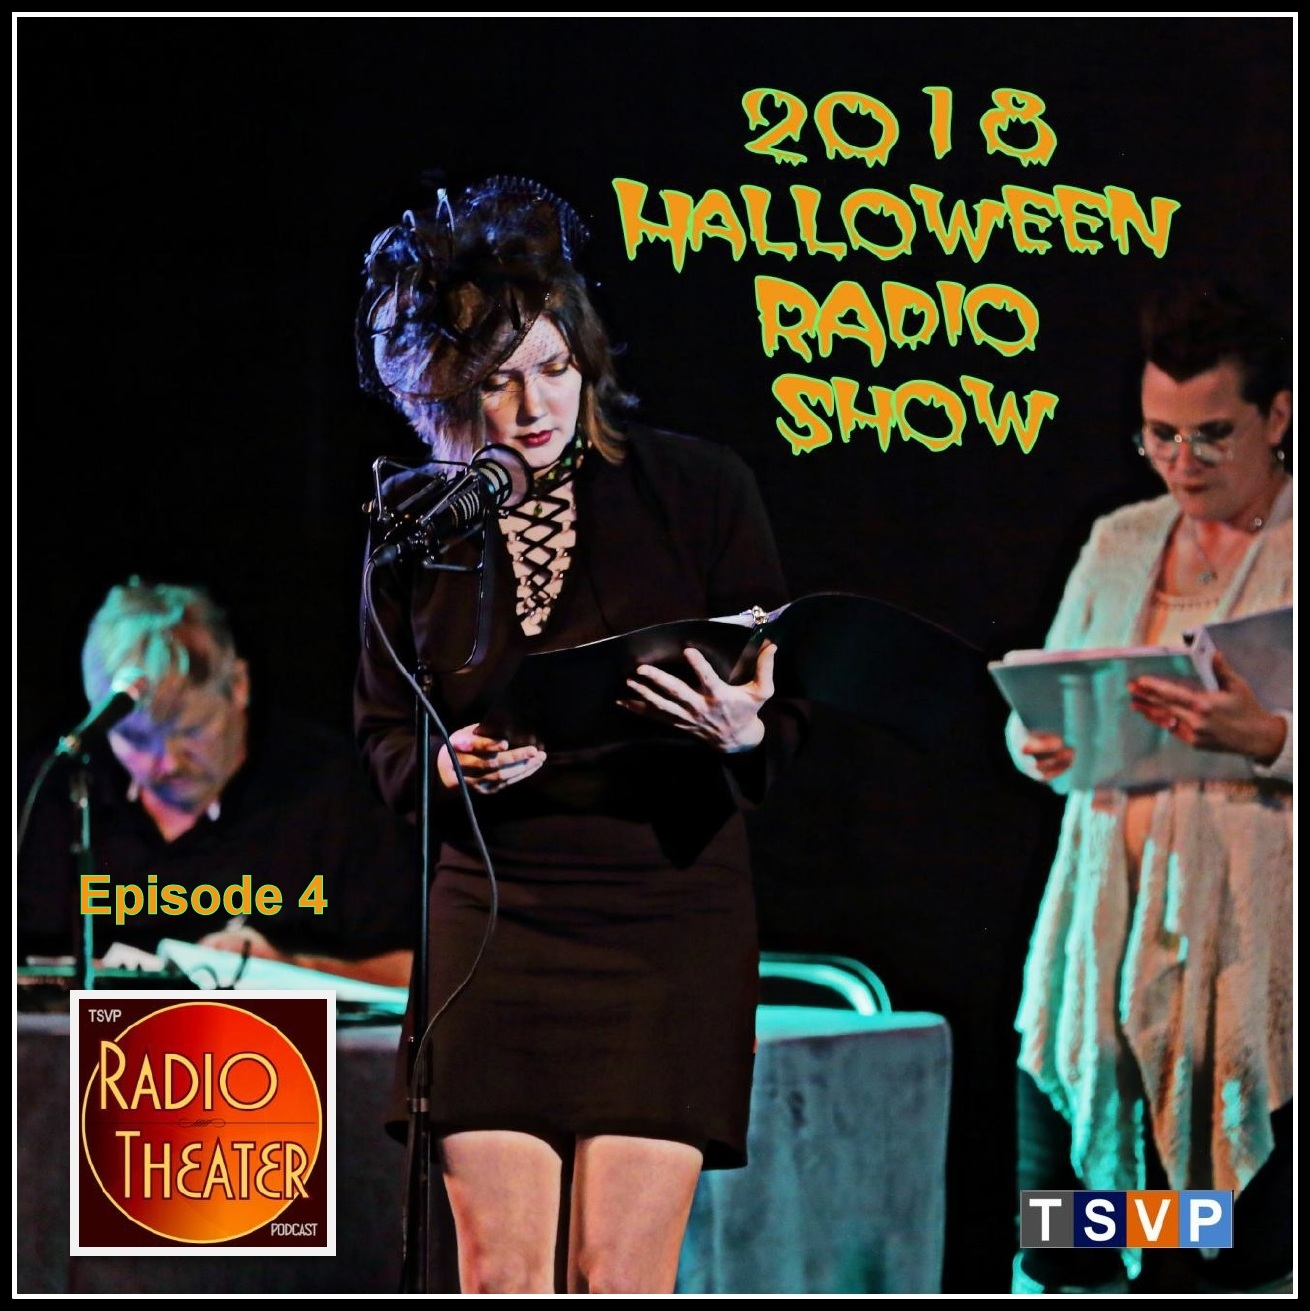 2018 Halloween Radio Show